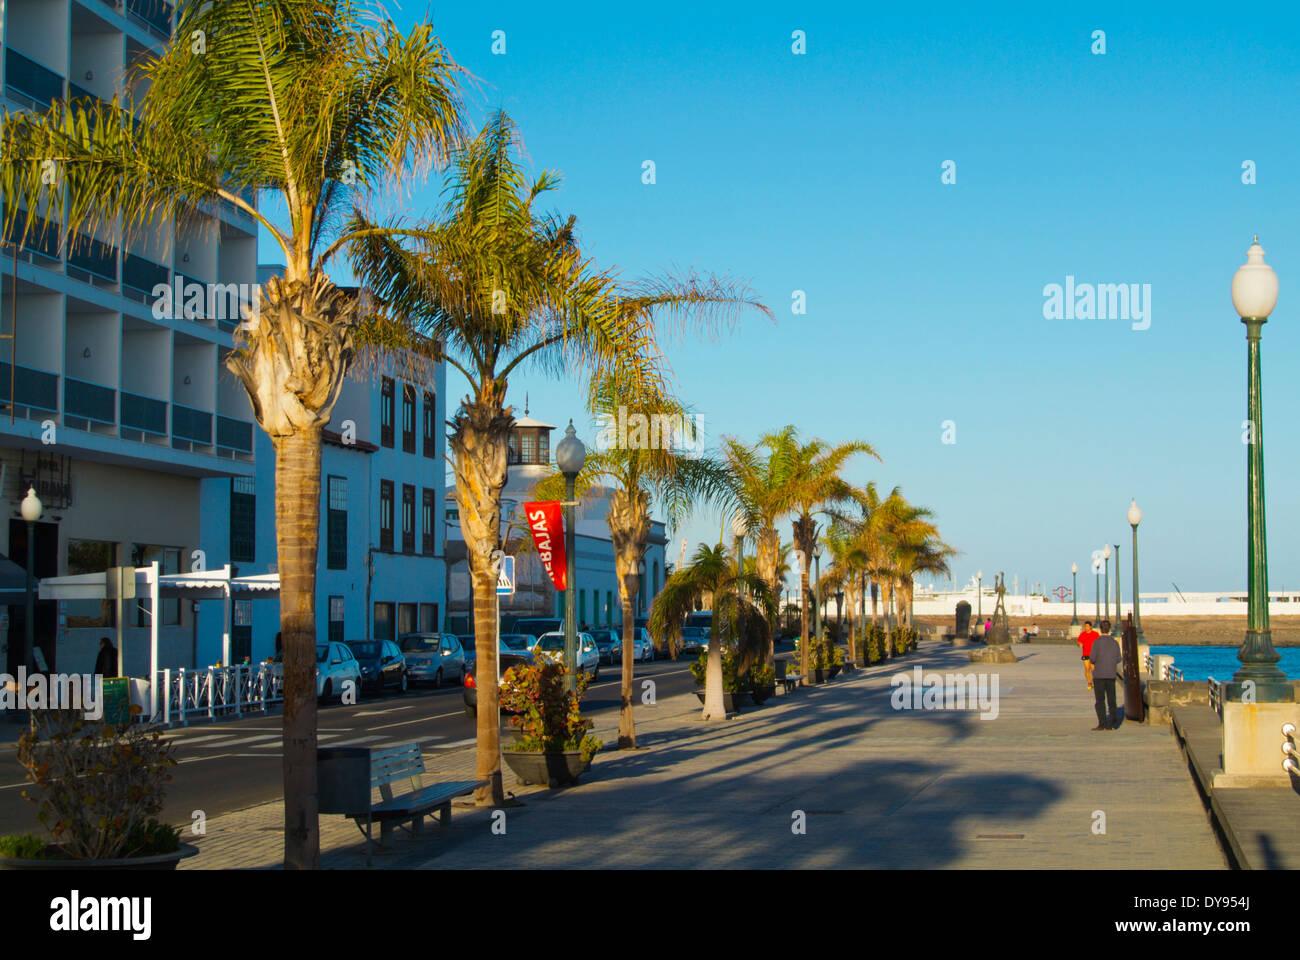 La Marina am Meer Straße, Arrecife, Lanzarote, Kanarische Inseln, Spanien, Europa Stockbild